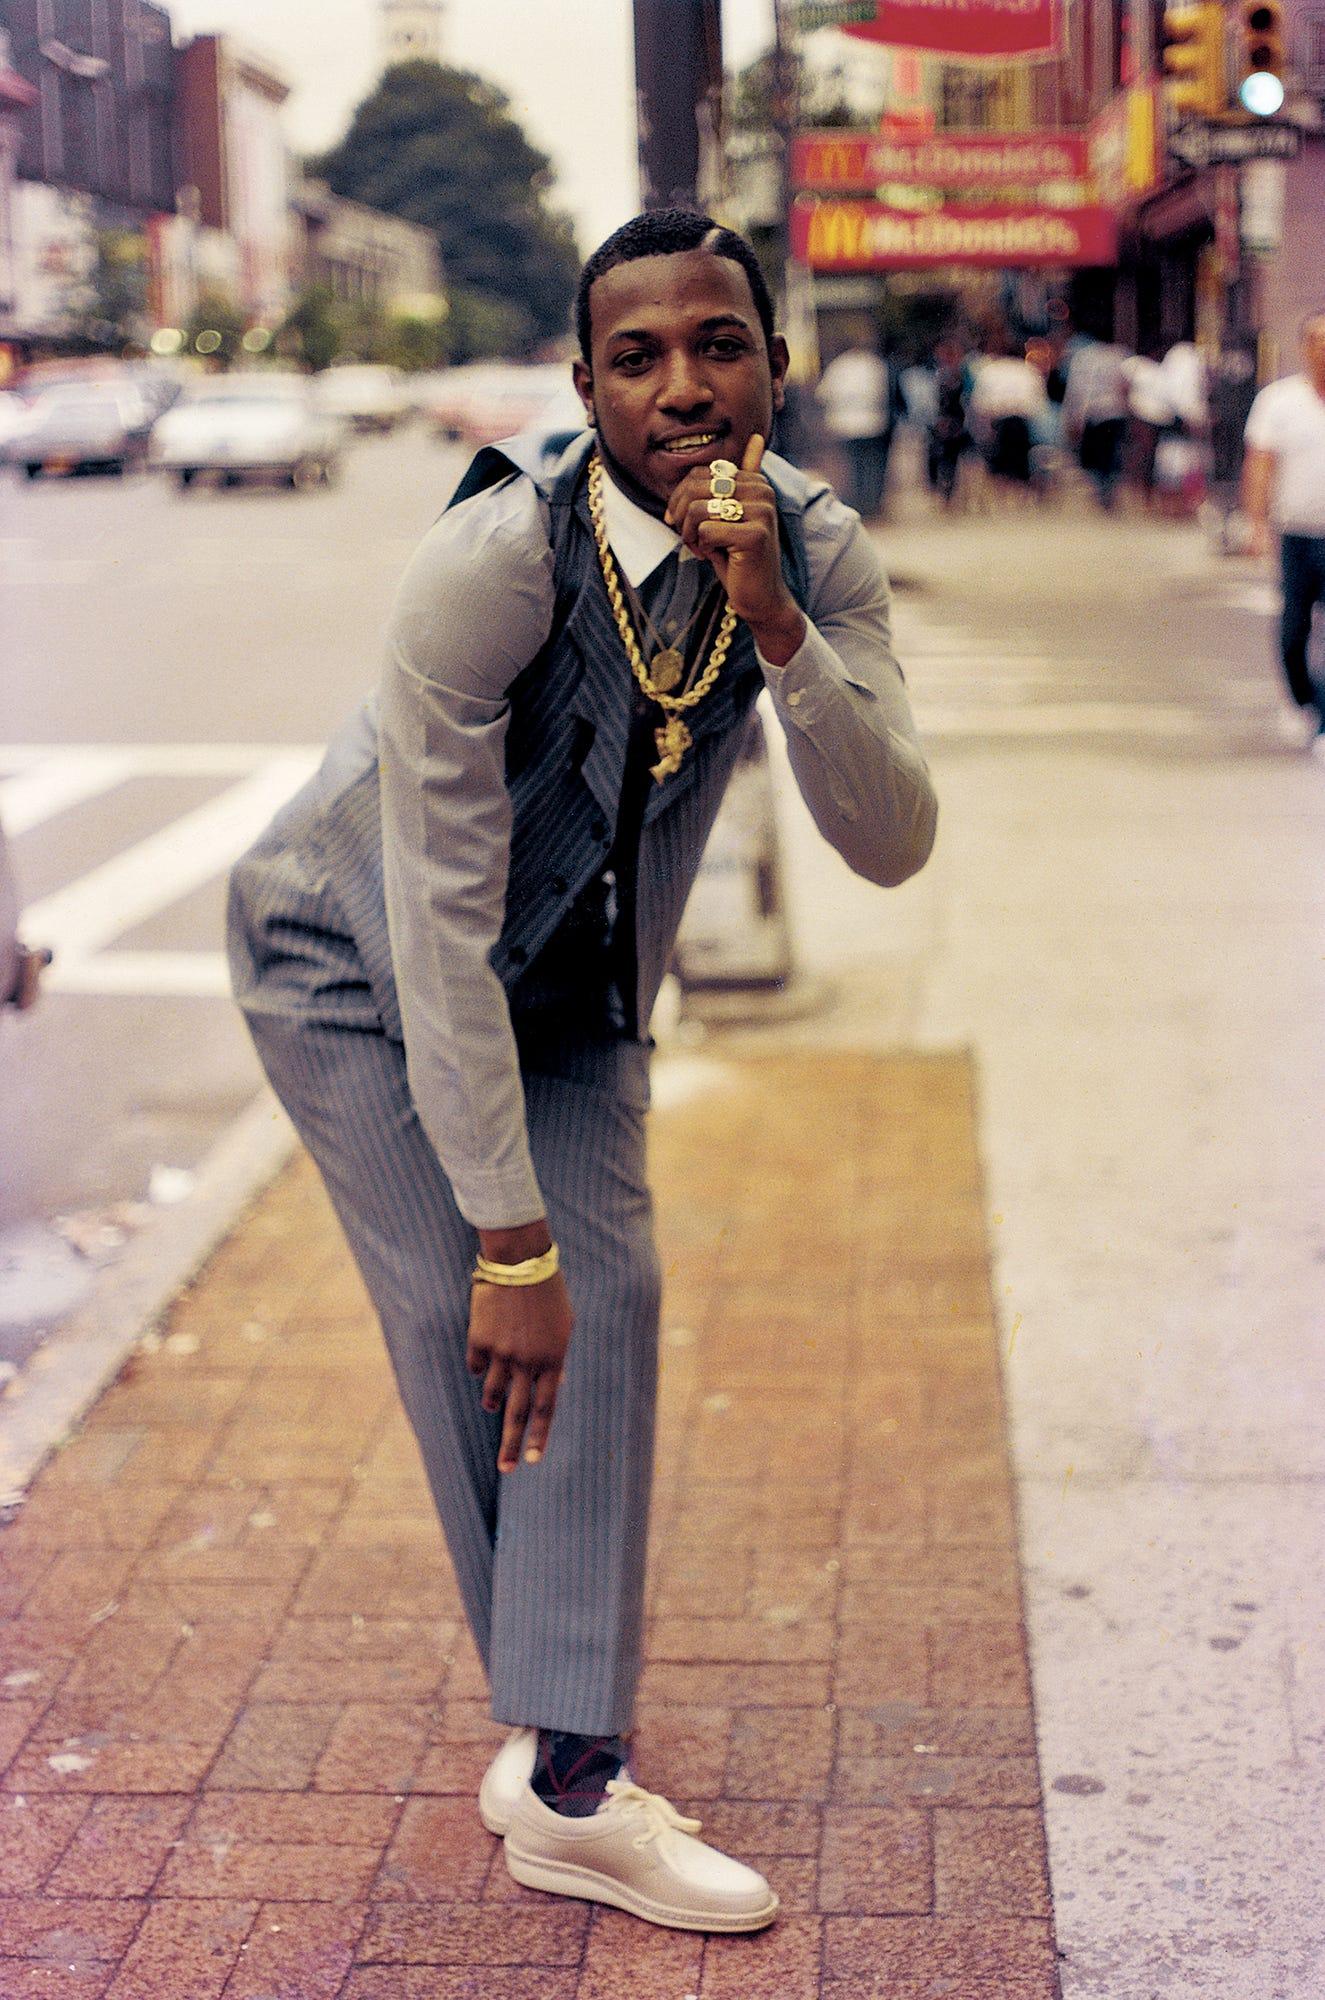 Jamaican Clarks Shoes